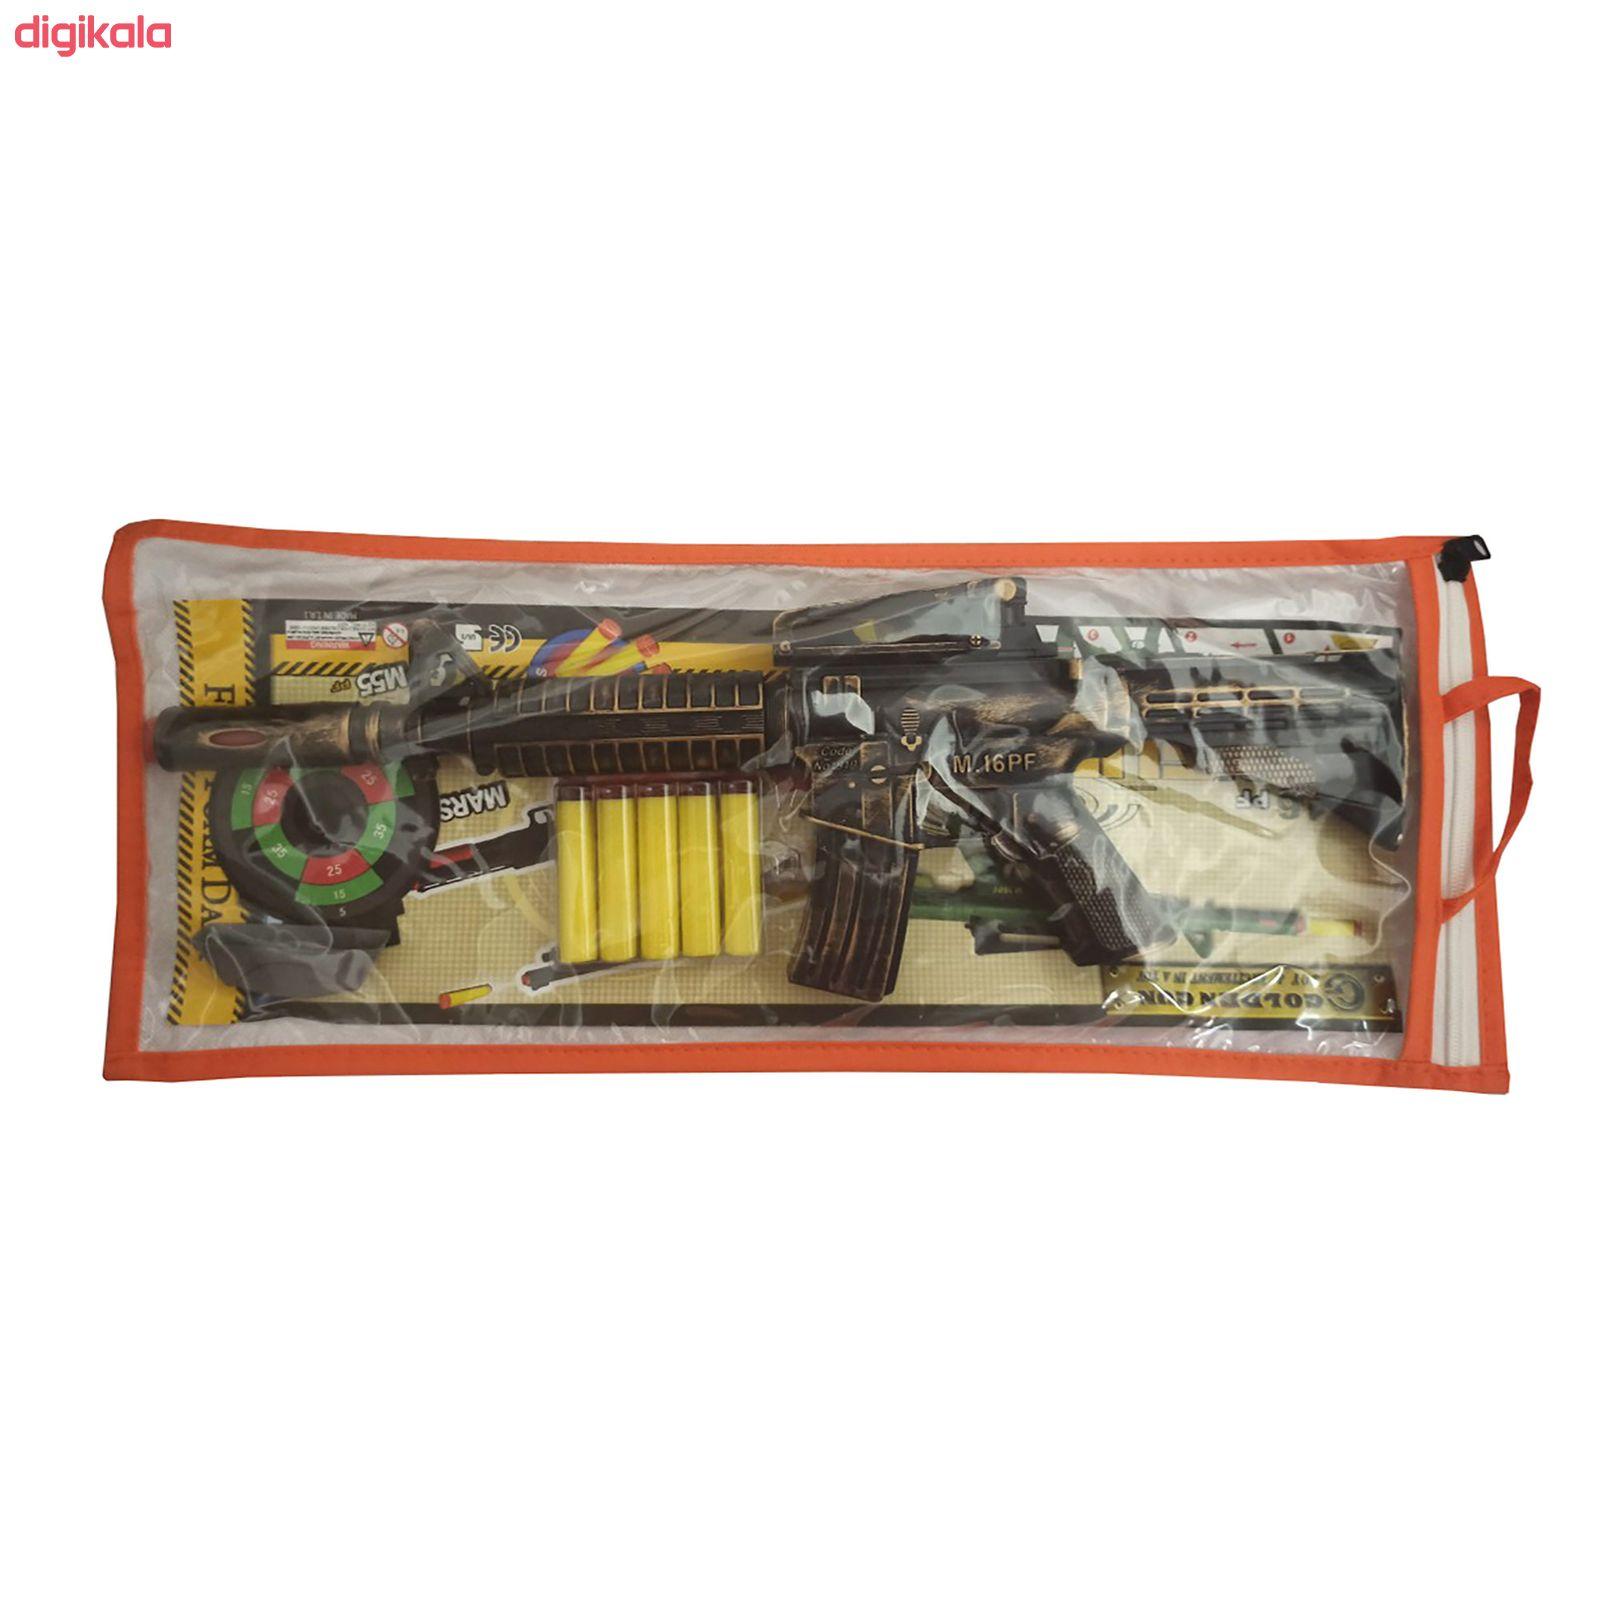 تفنگ بازی گلدن گان مدل naabsell-p10 مجموعه 3 عددی main 1 7